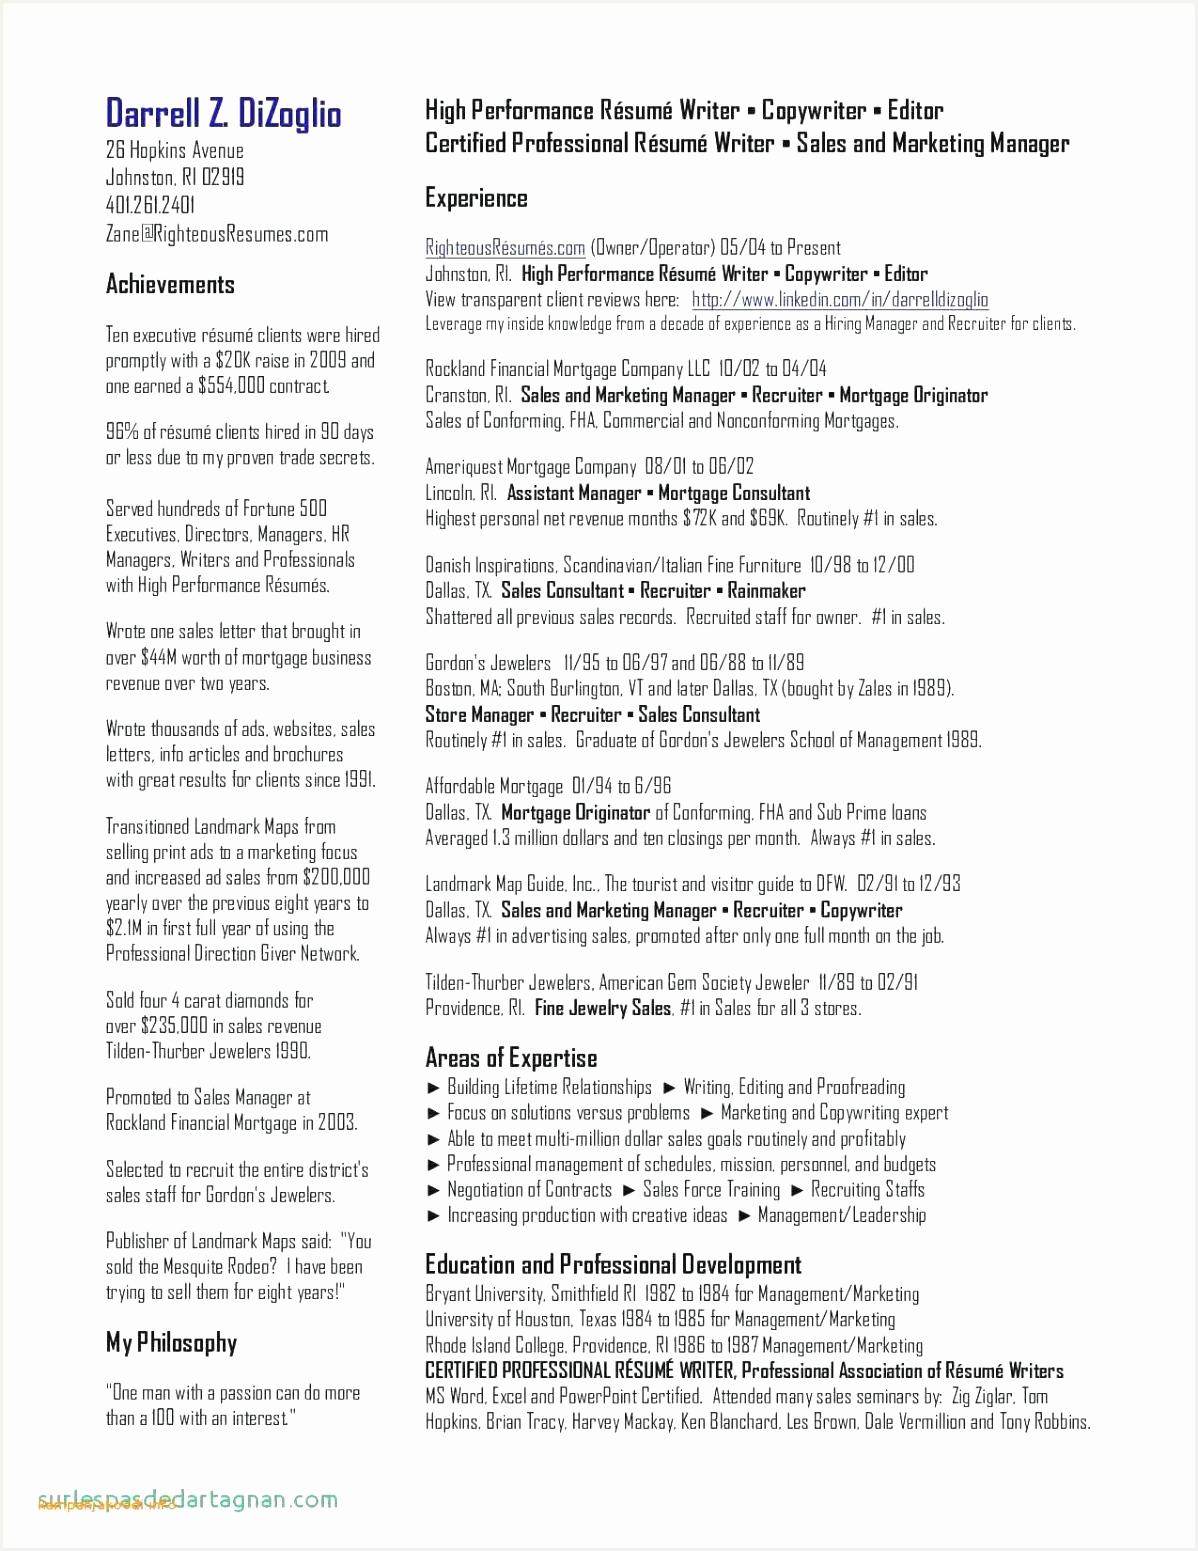 Microsoft Office Resume Samples X6sgn Elegant Microsoft Templates Resume – Sample Resume format 2019 Of Microsoft Office Resume Samples Gbk2p Inspirational Customer Service Resume Sample Beautiful Resume Examples 0d Skills